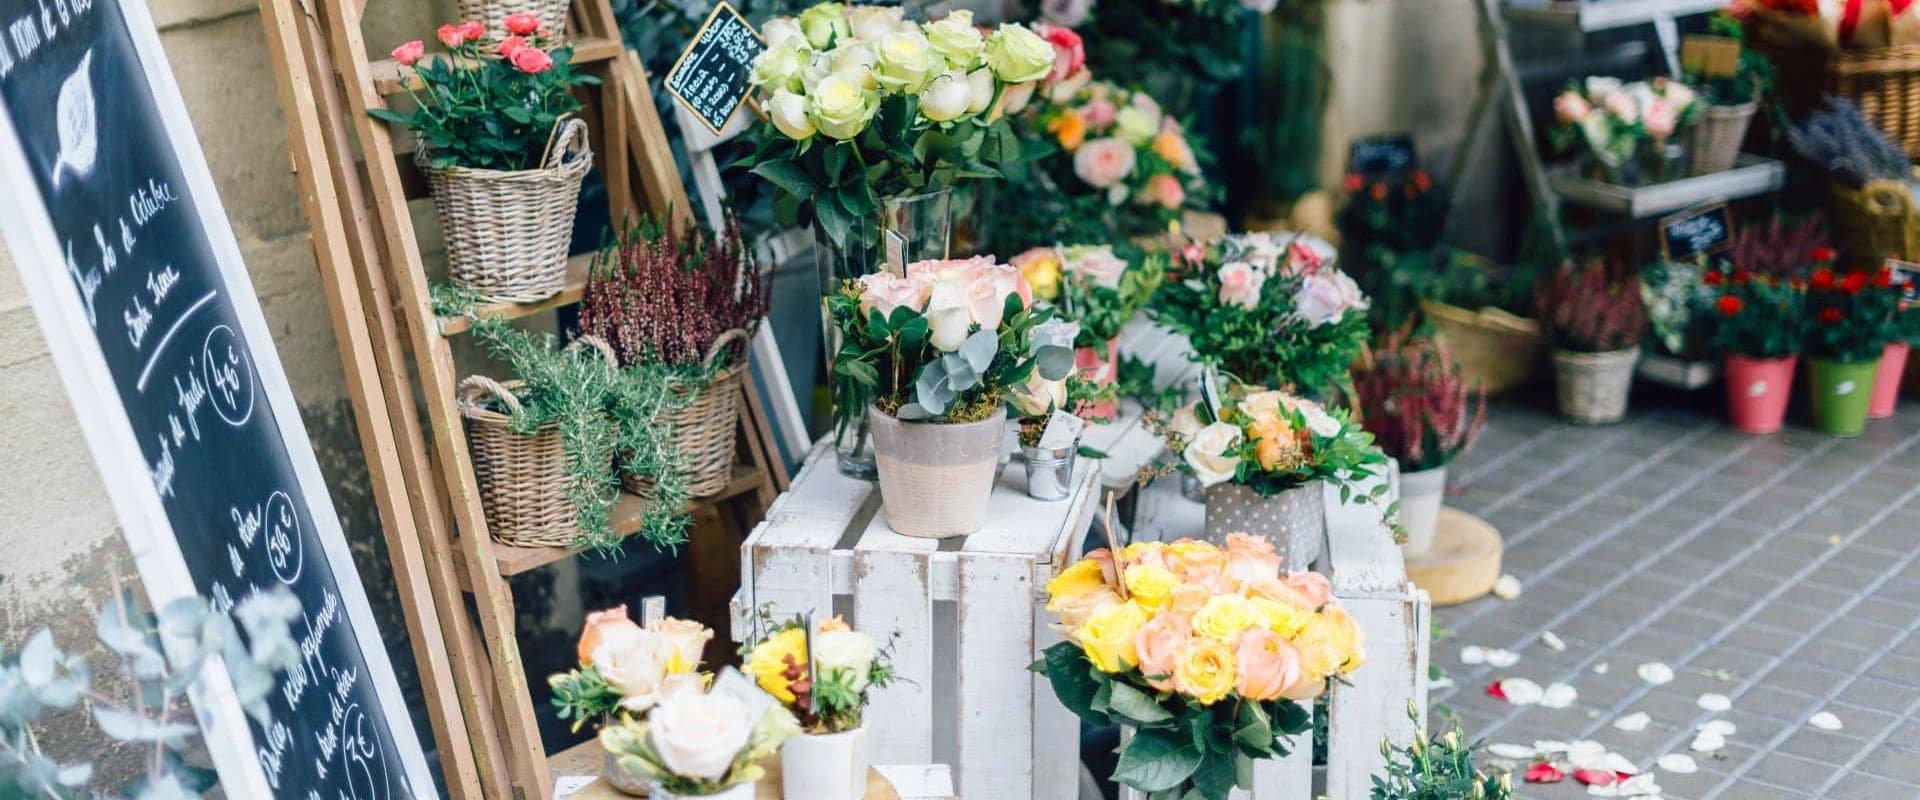 Blumengroßhandel / Blumengeschäft Branche Software